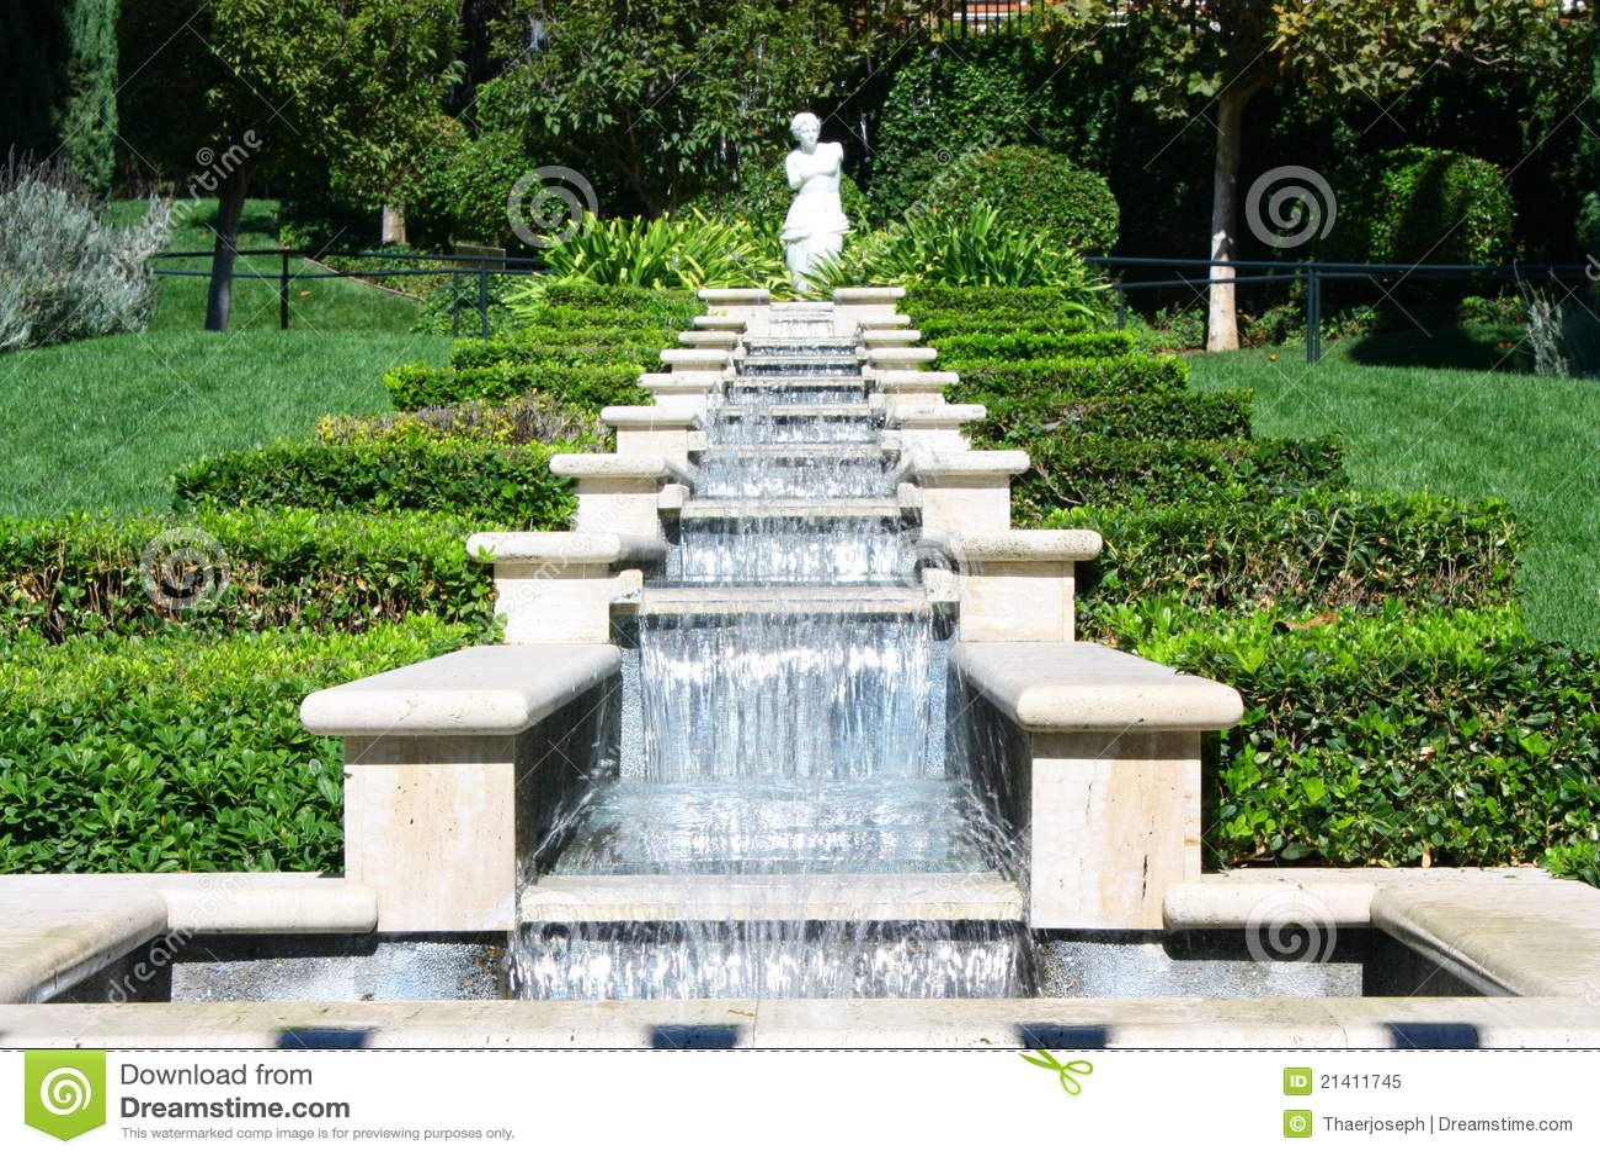 De franse waterval van de tuin stock afbeelding for Franse tuin